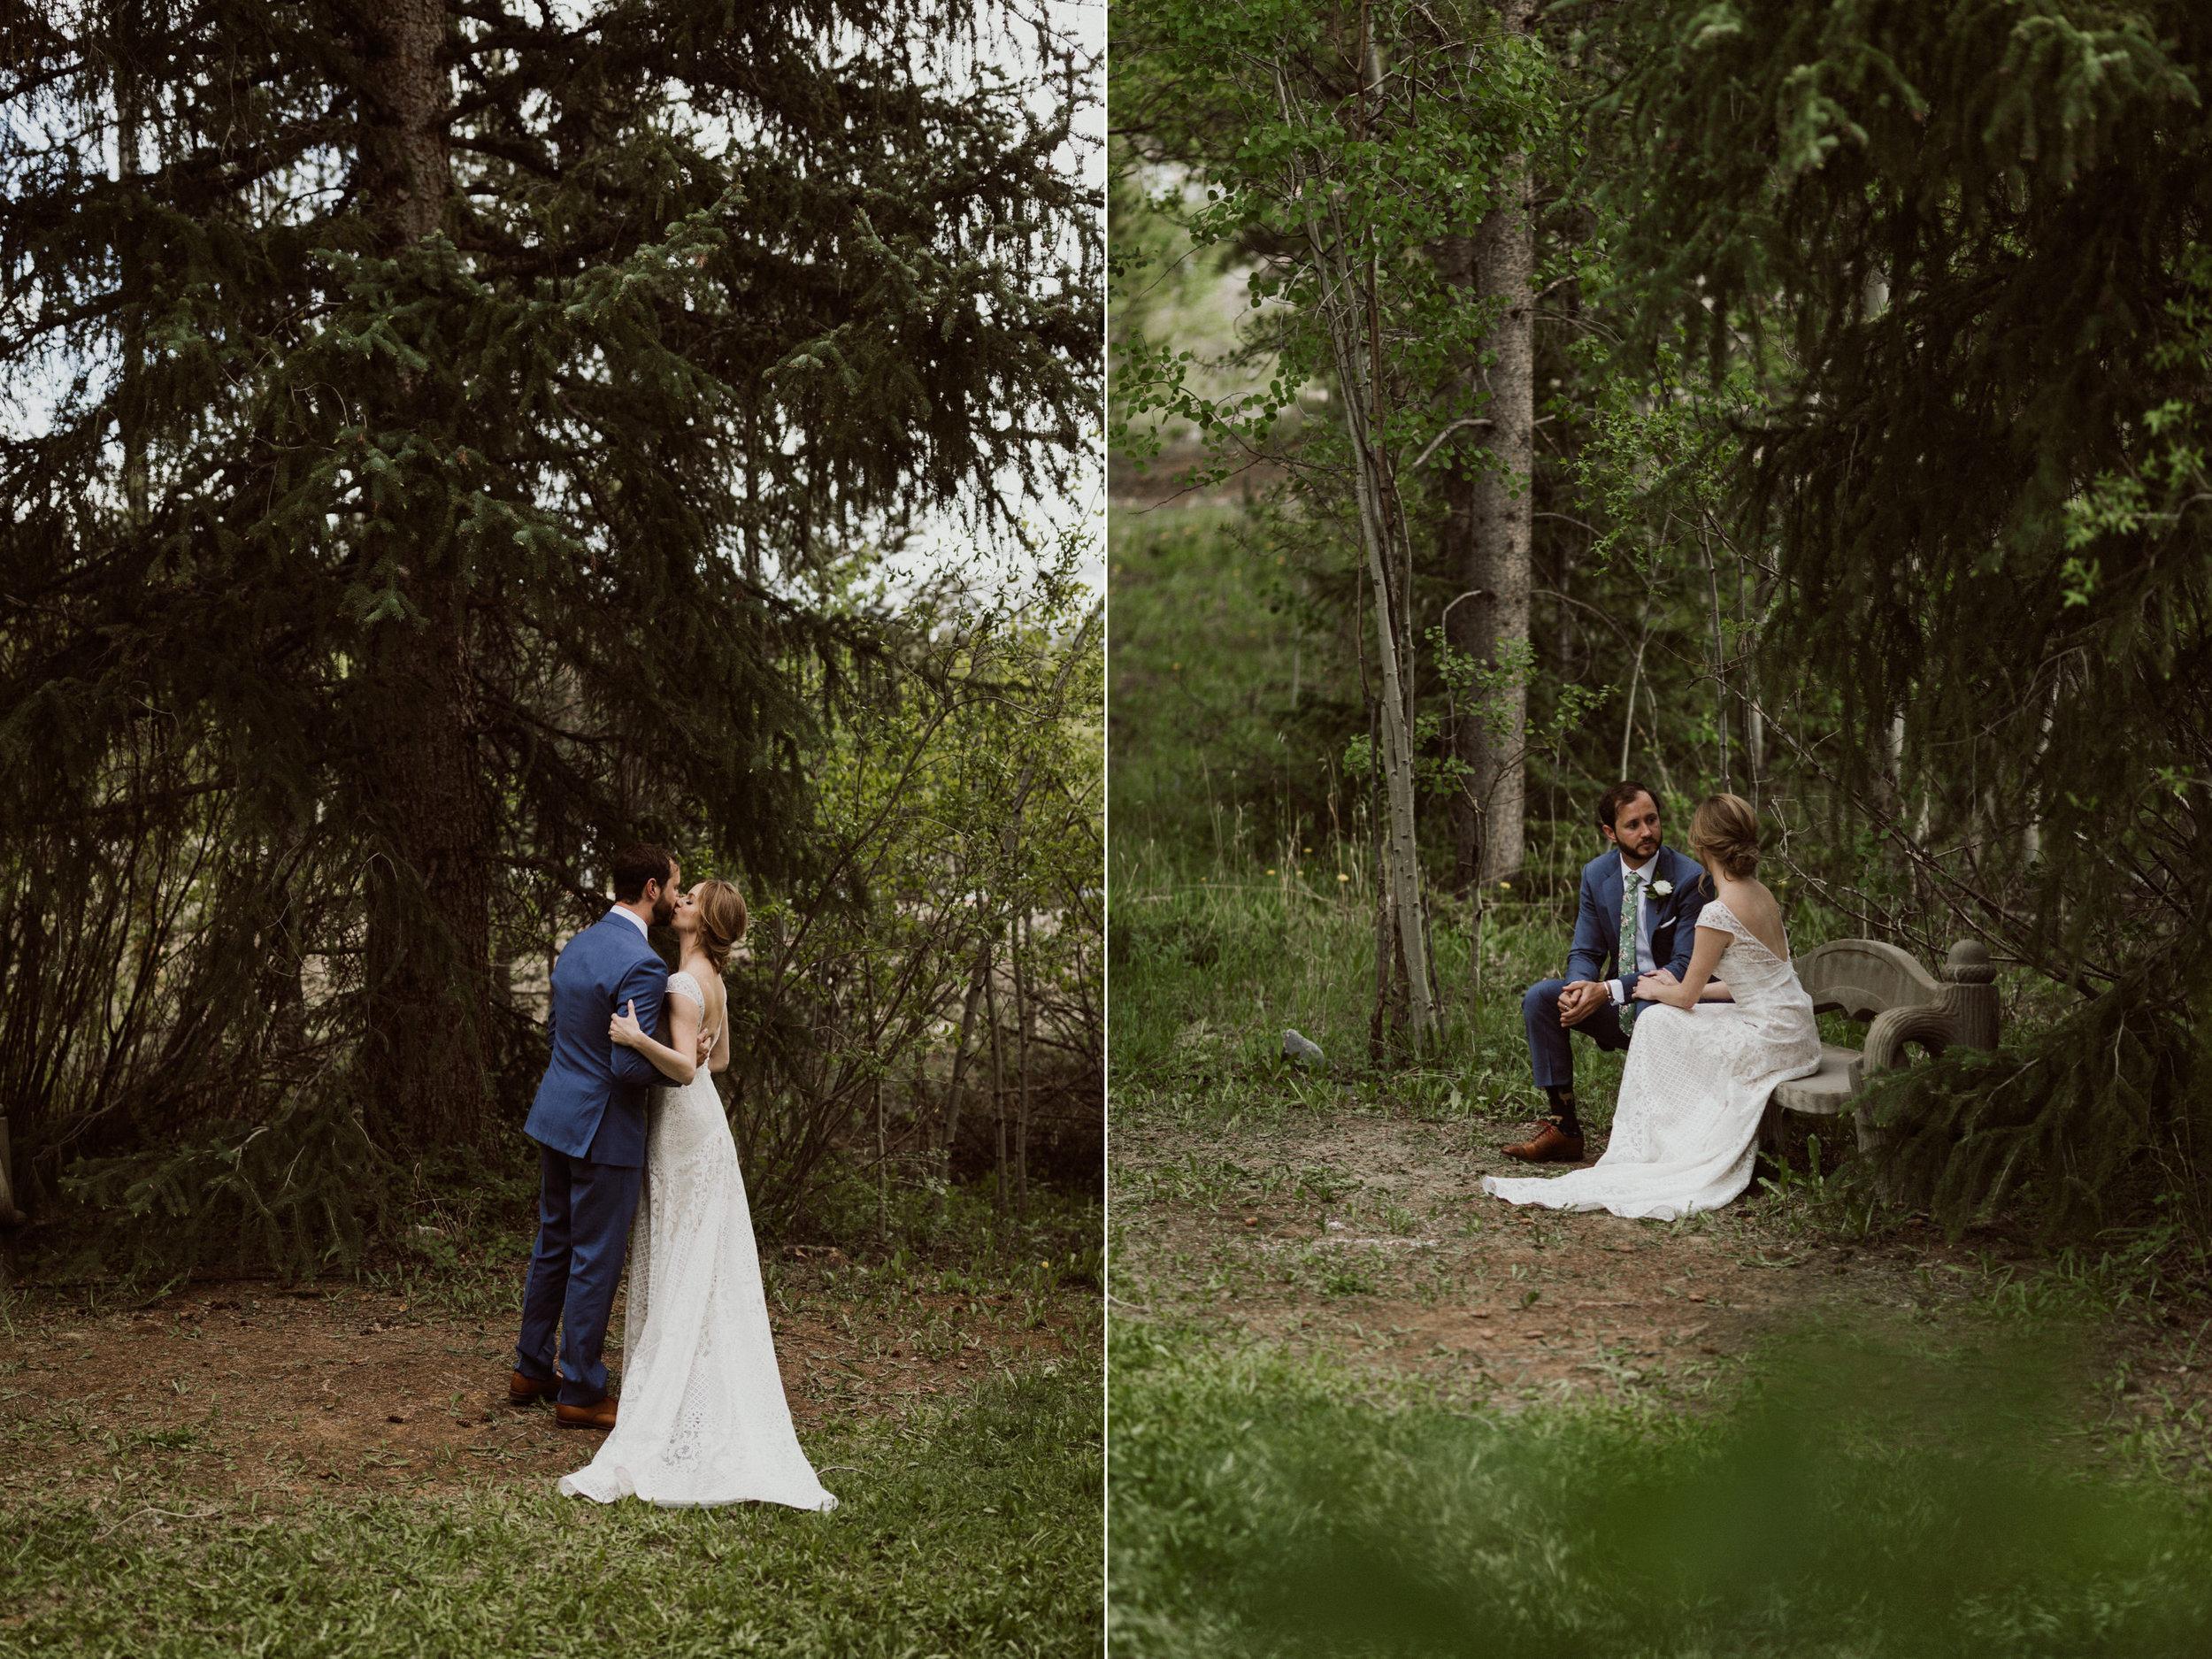 bohemian-backyard-wedding-breckenridge-colorado-164.jpg